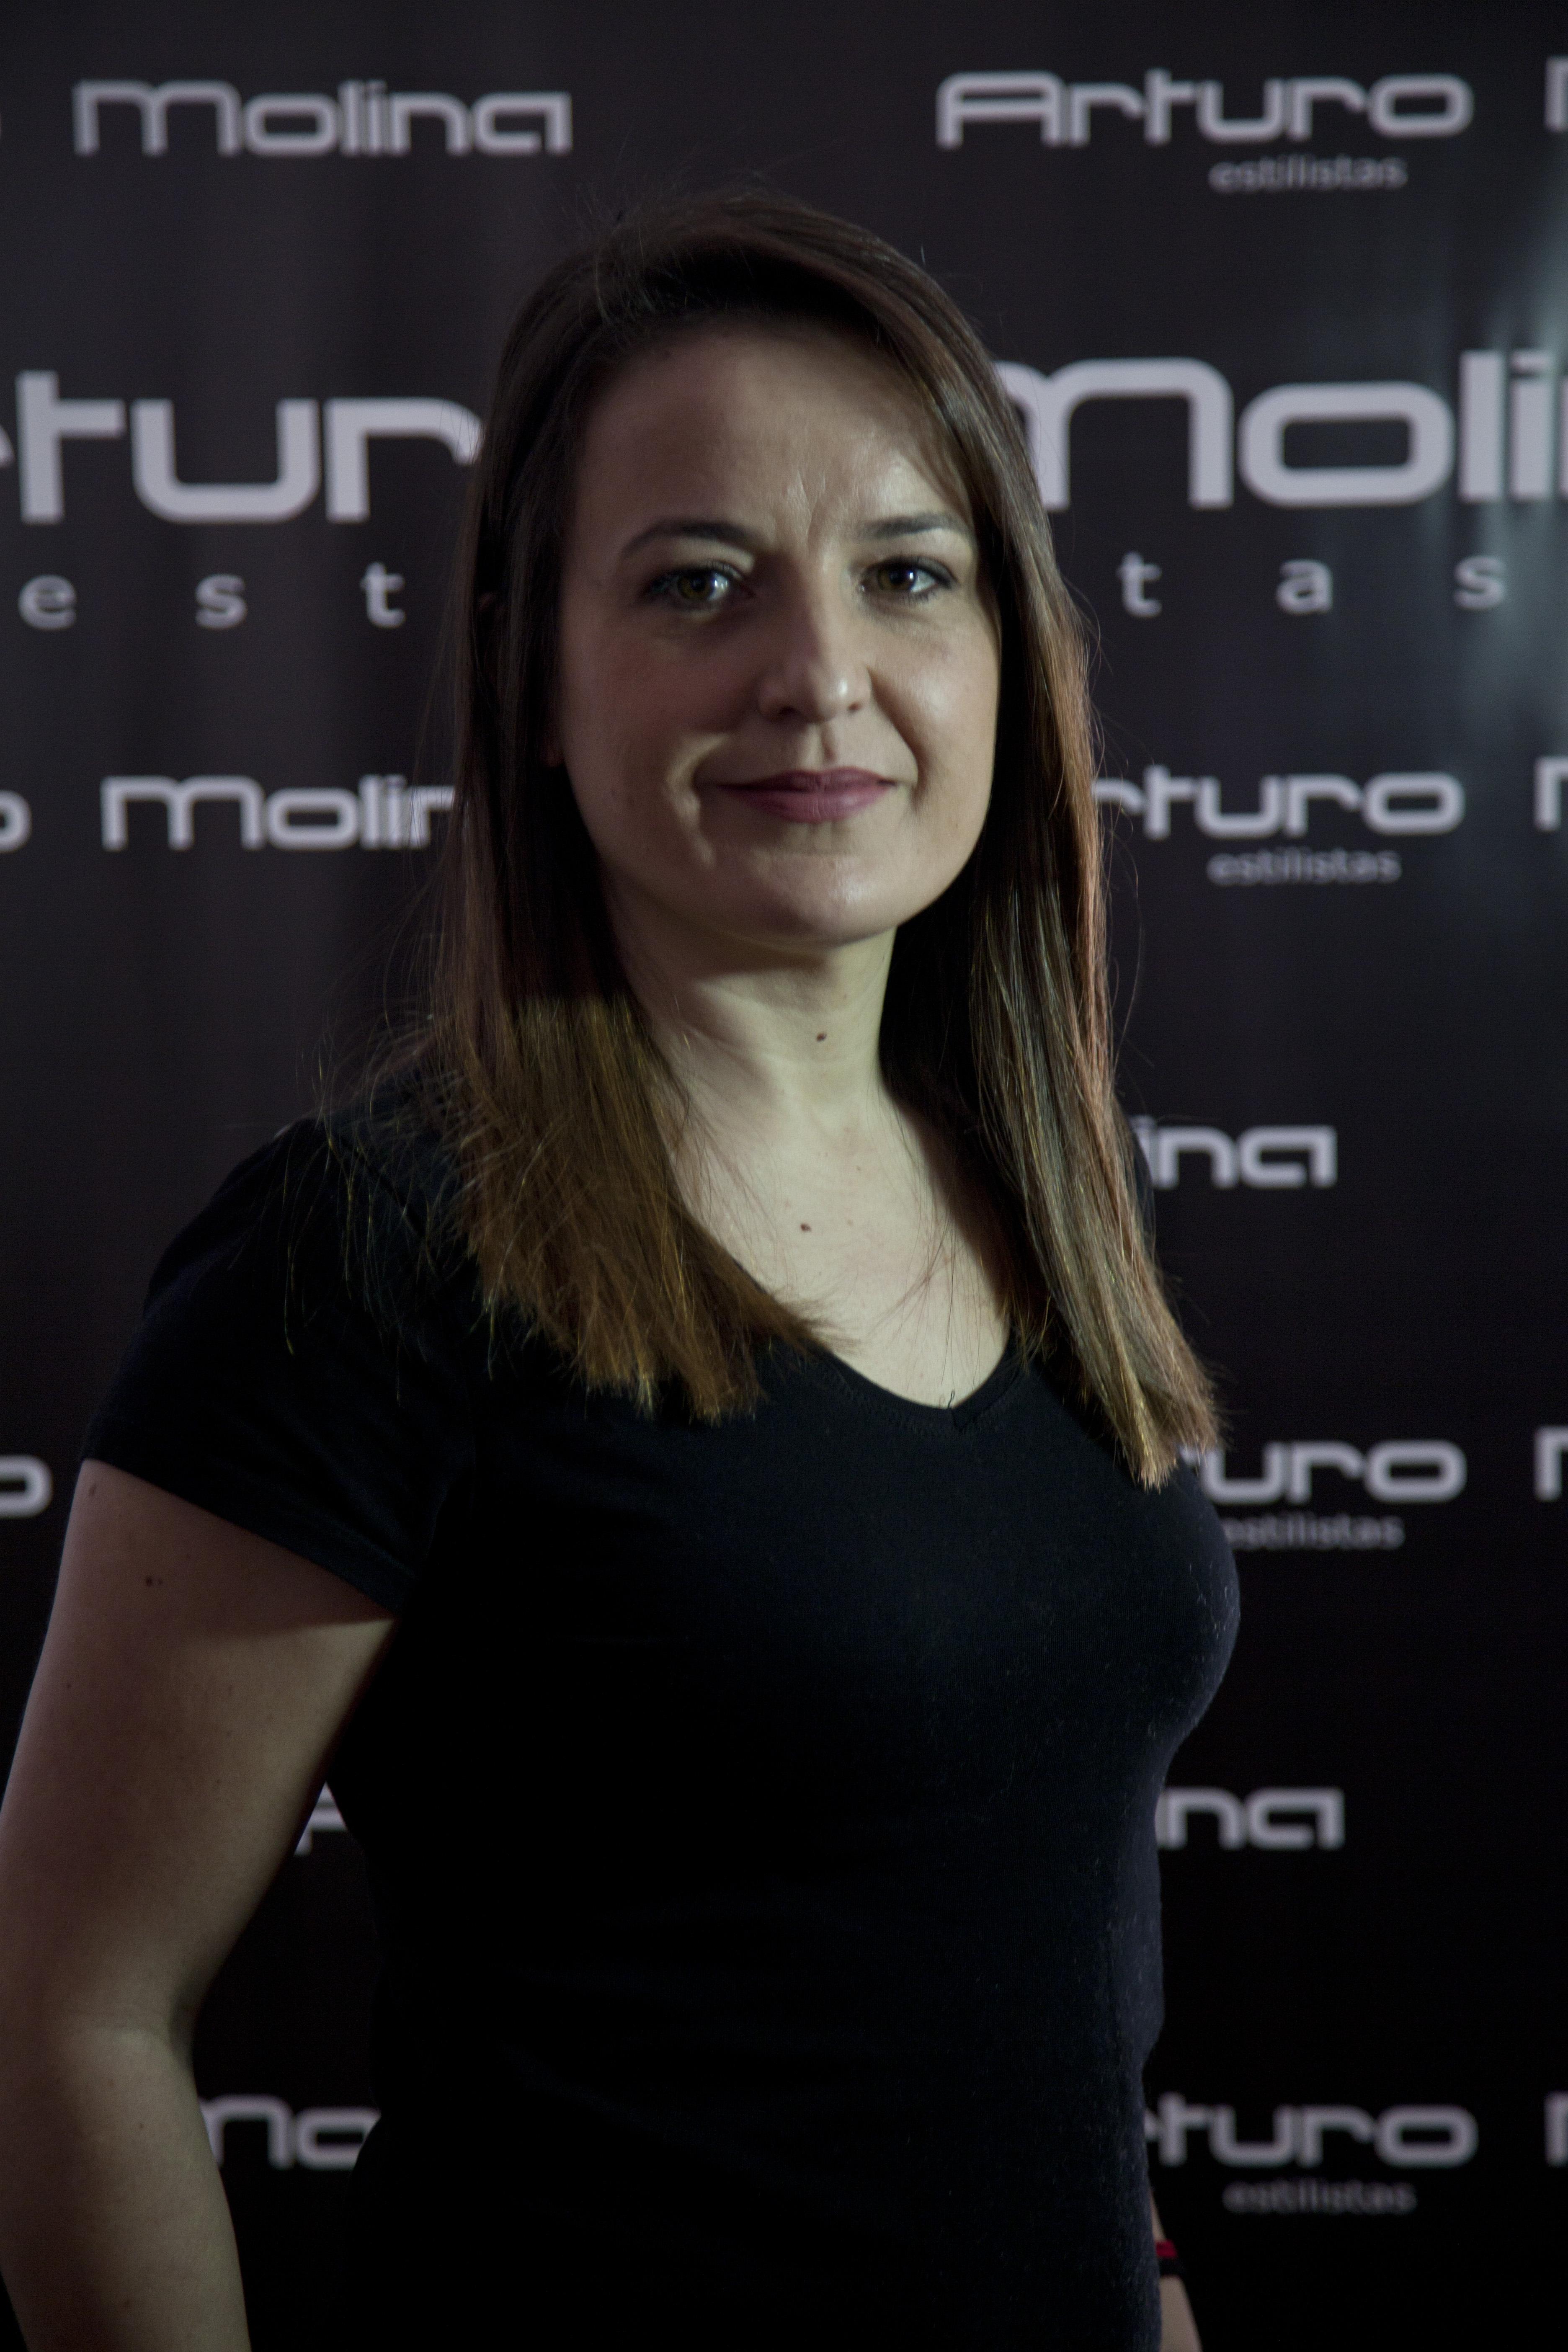 ArturoMOLINA-40